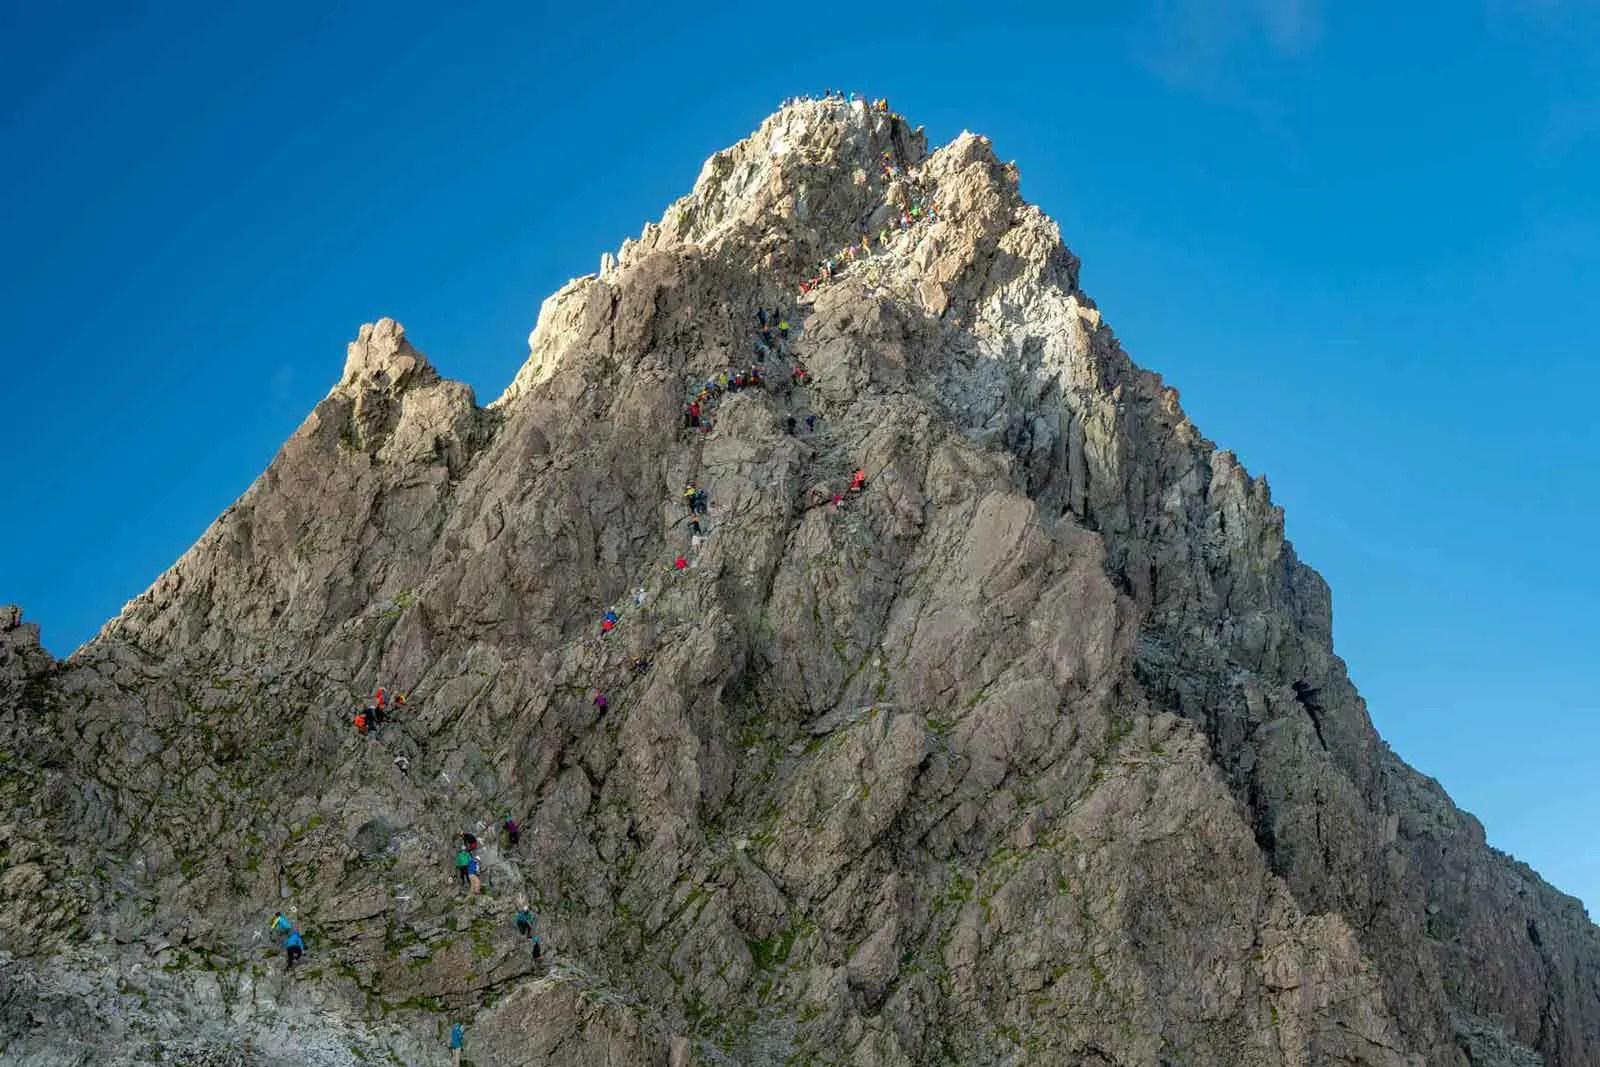 Japan Alps Traverse Kita Alps Yarigatake Crowds